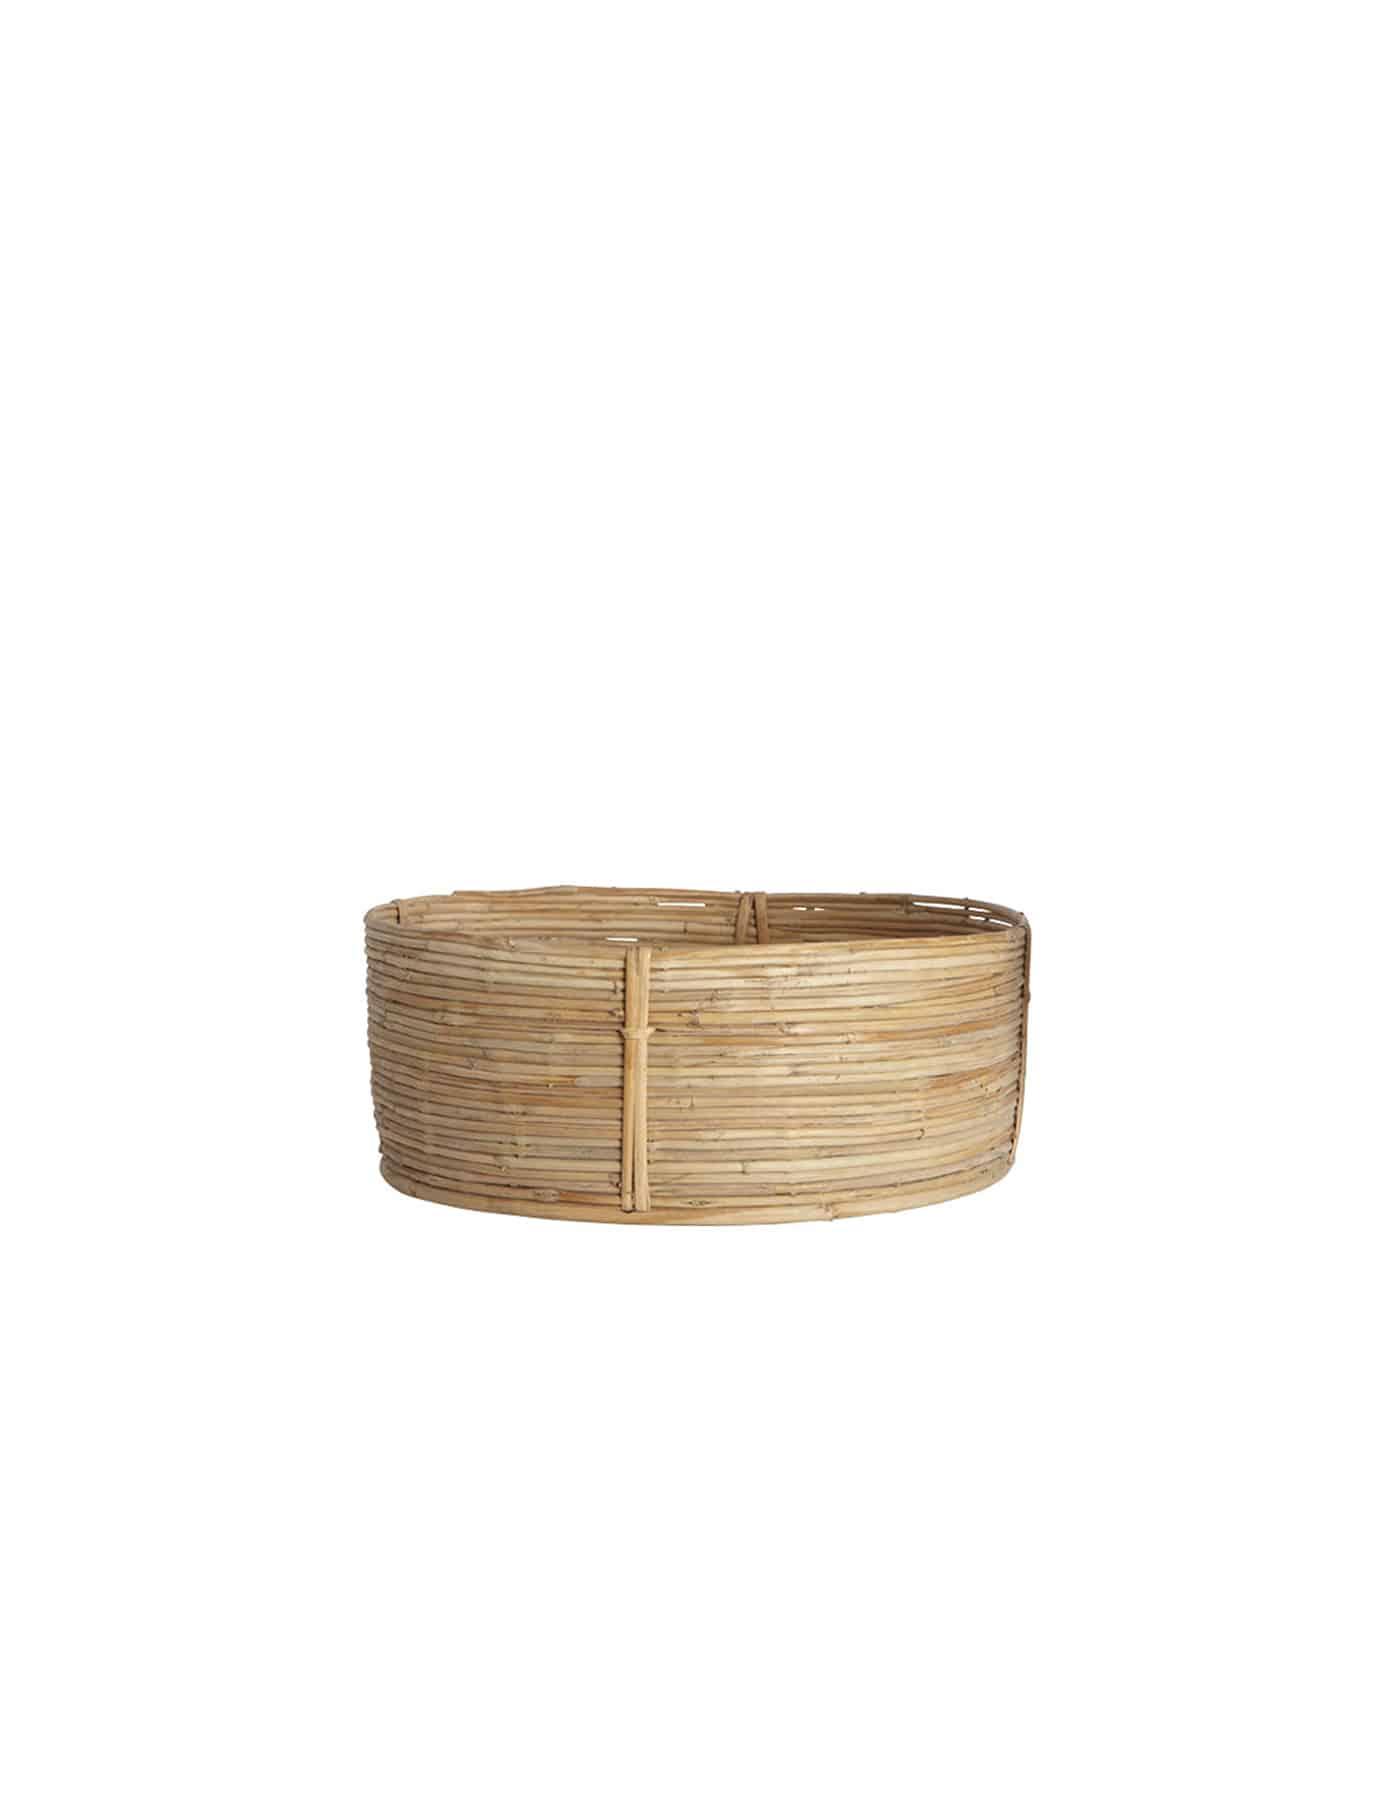 Medium Retro Rattan Basket, House Doctor